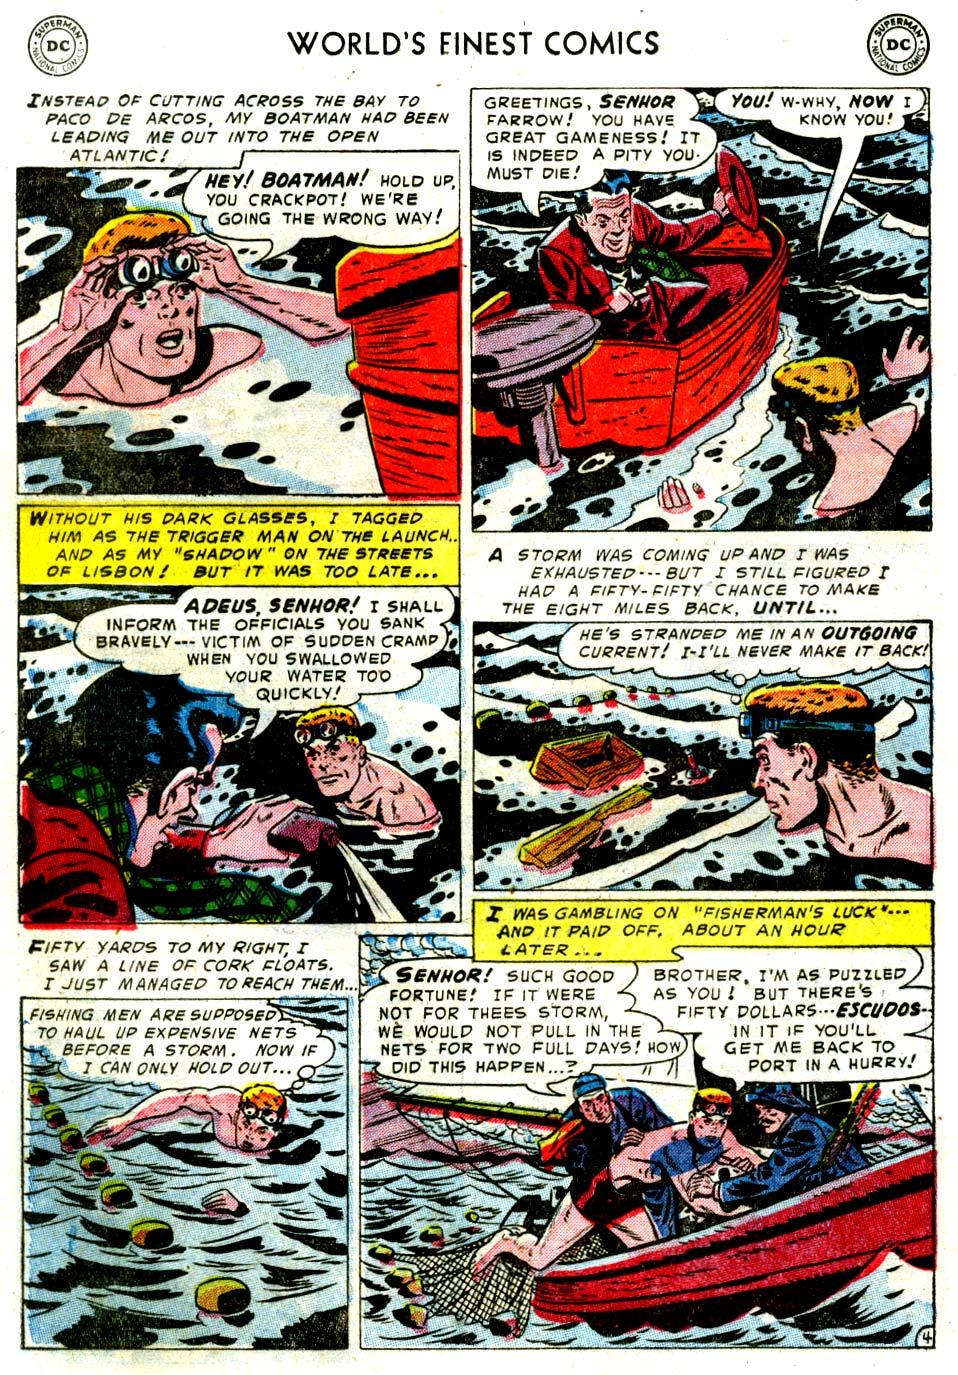 Read online World's Finest Comics comic -  Issue #68 - 46